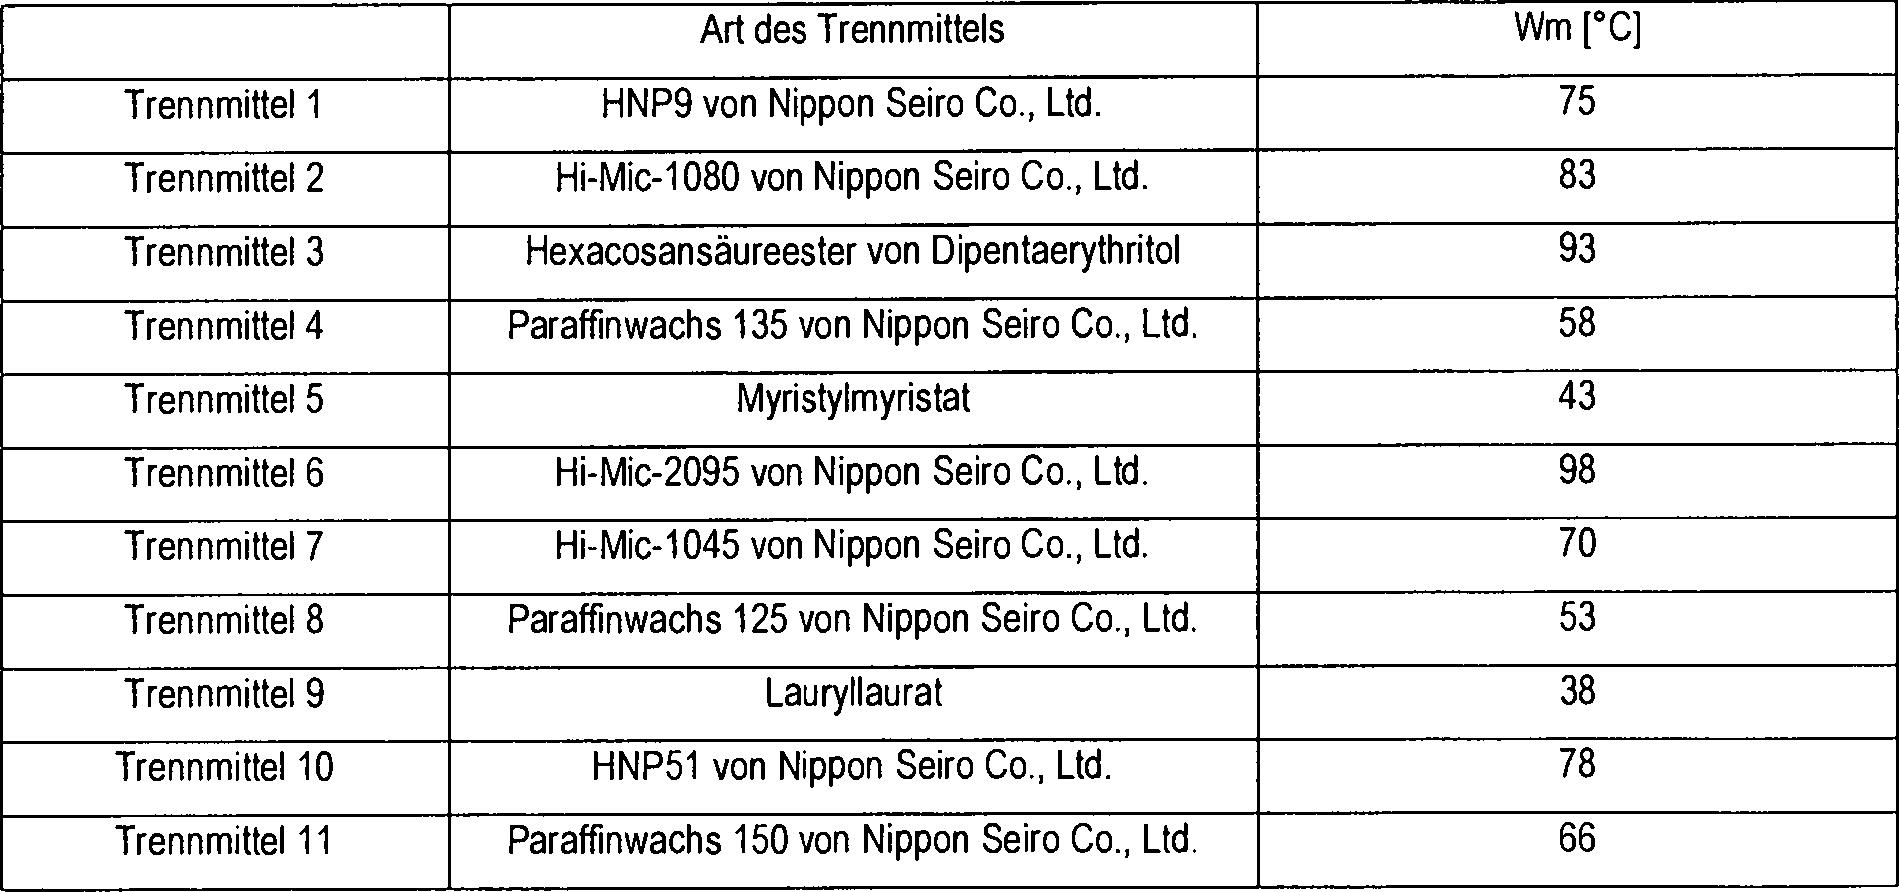 DE112013000797T5 - magnetic toner - Google Patents